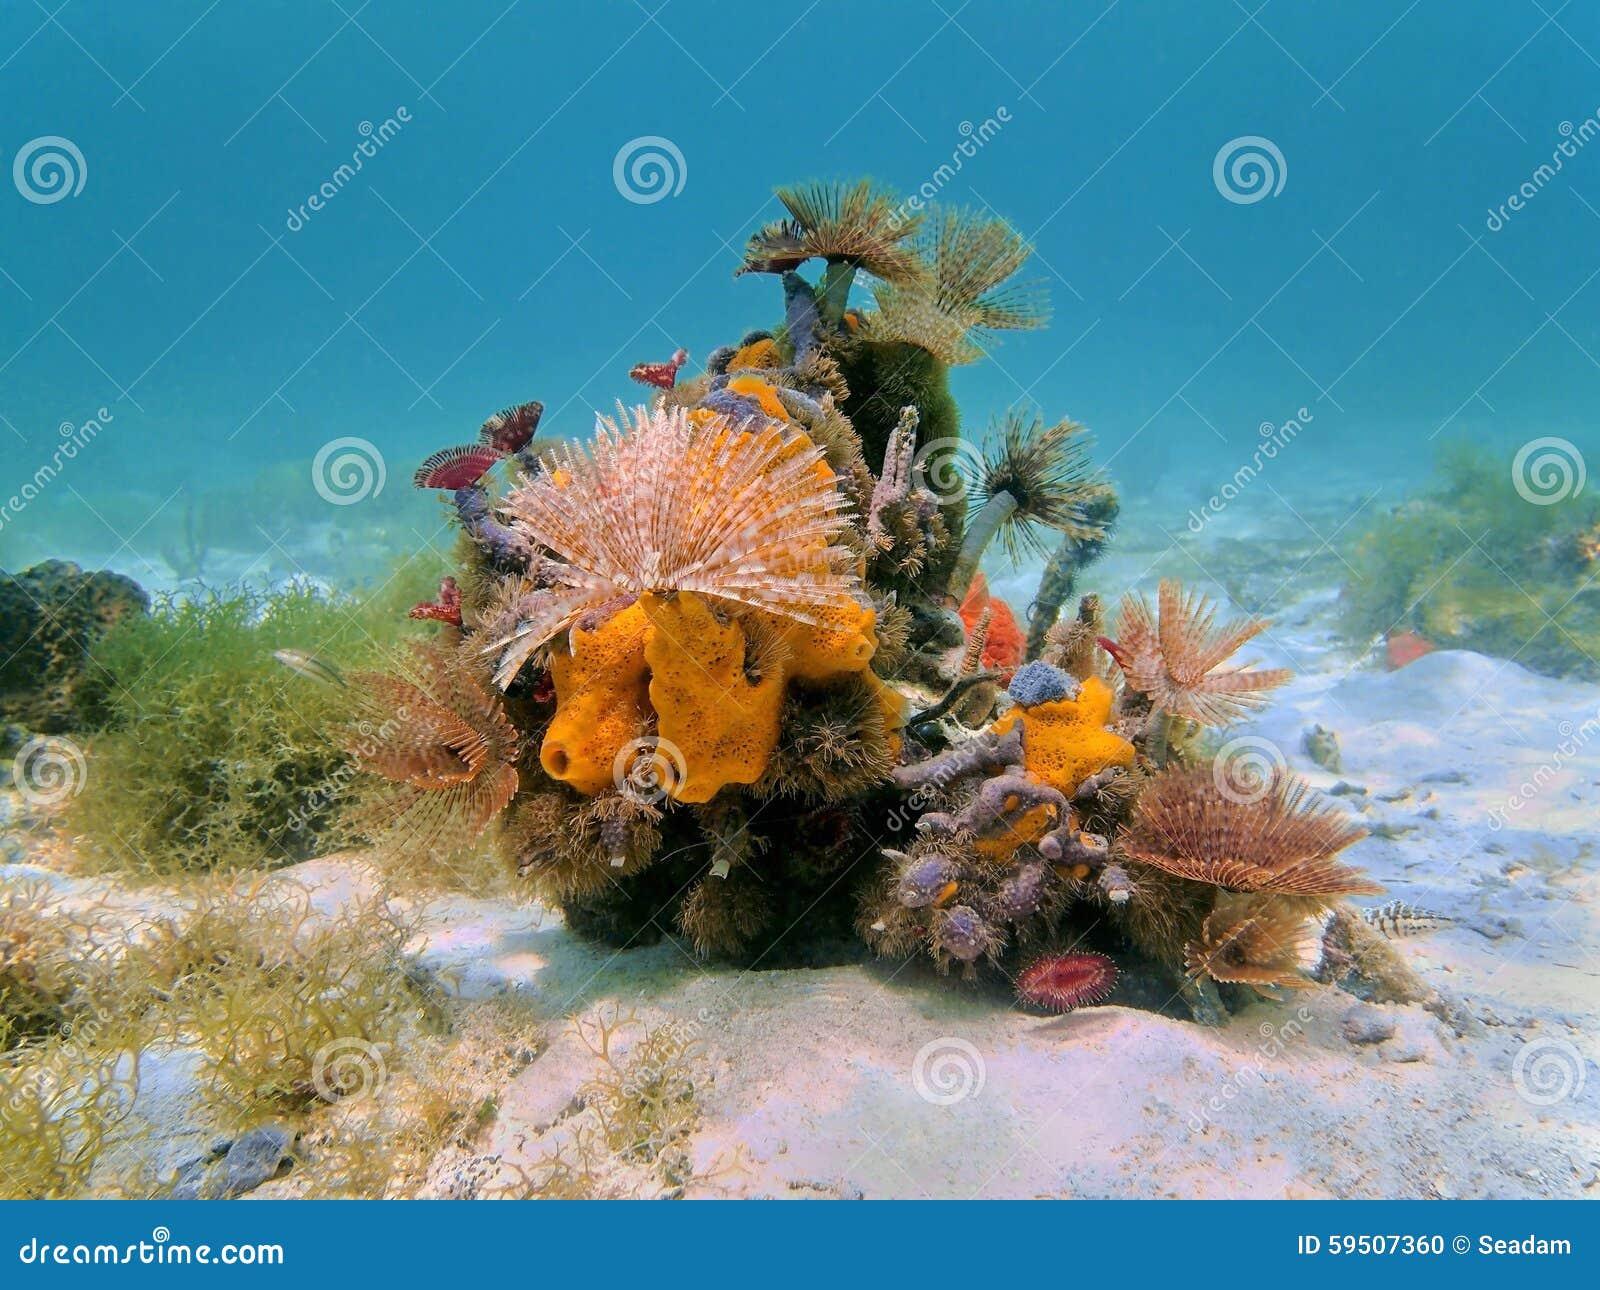 Colorful Underwater Marine Life Caribbean Sea Stock Photo ... |Colorful Underwater Life